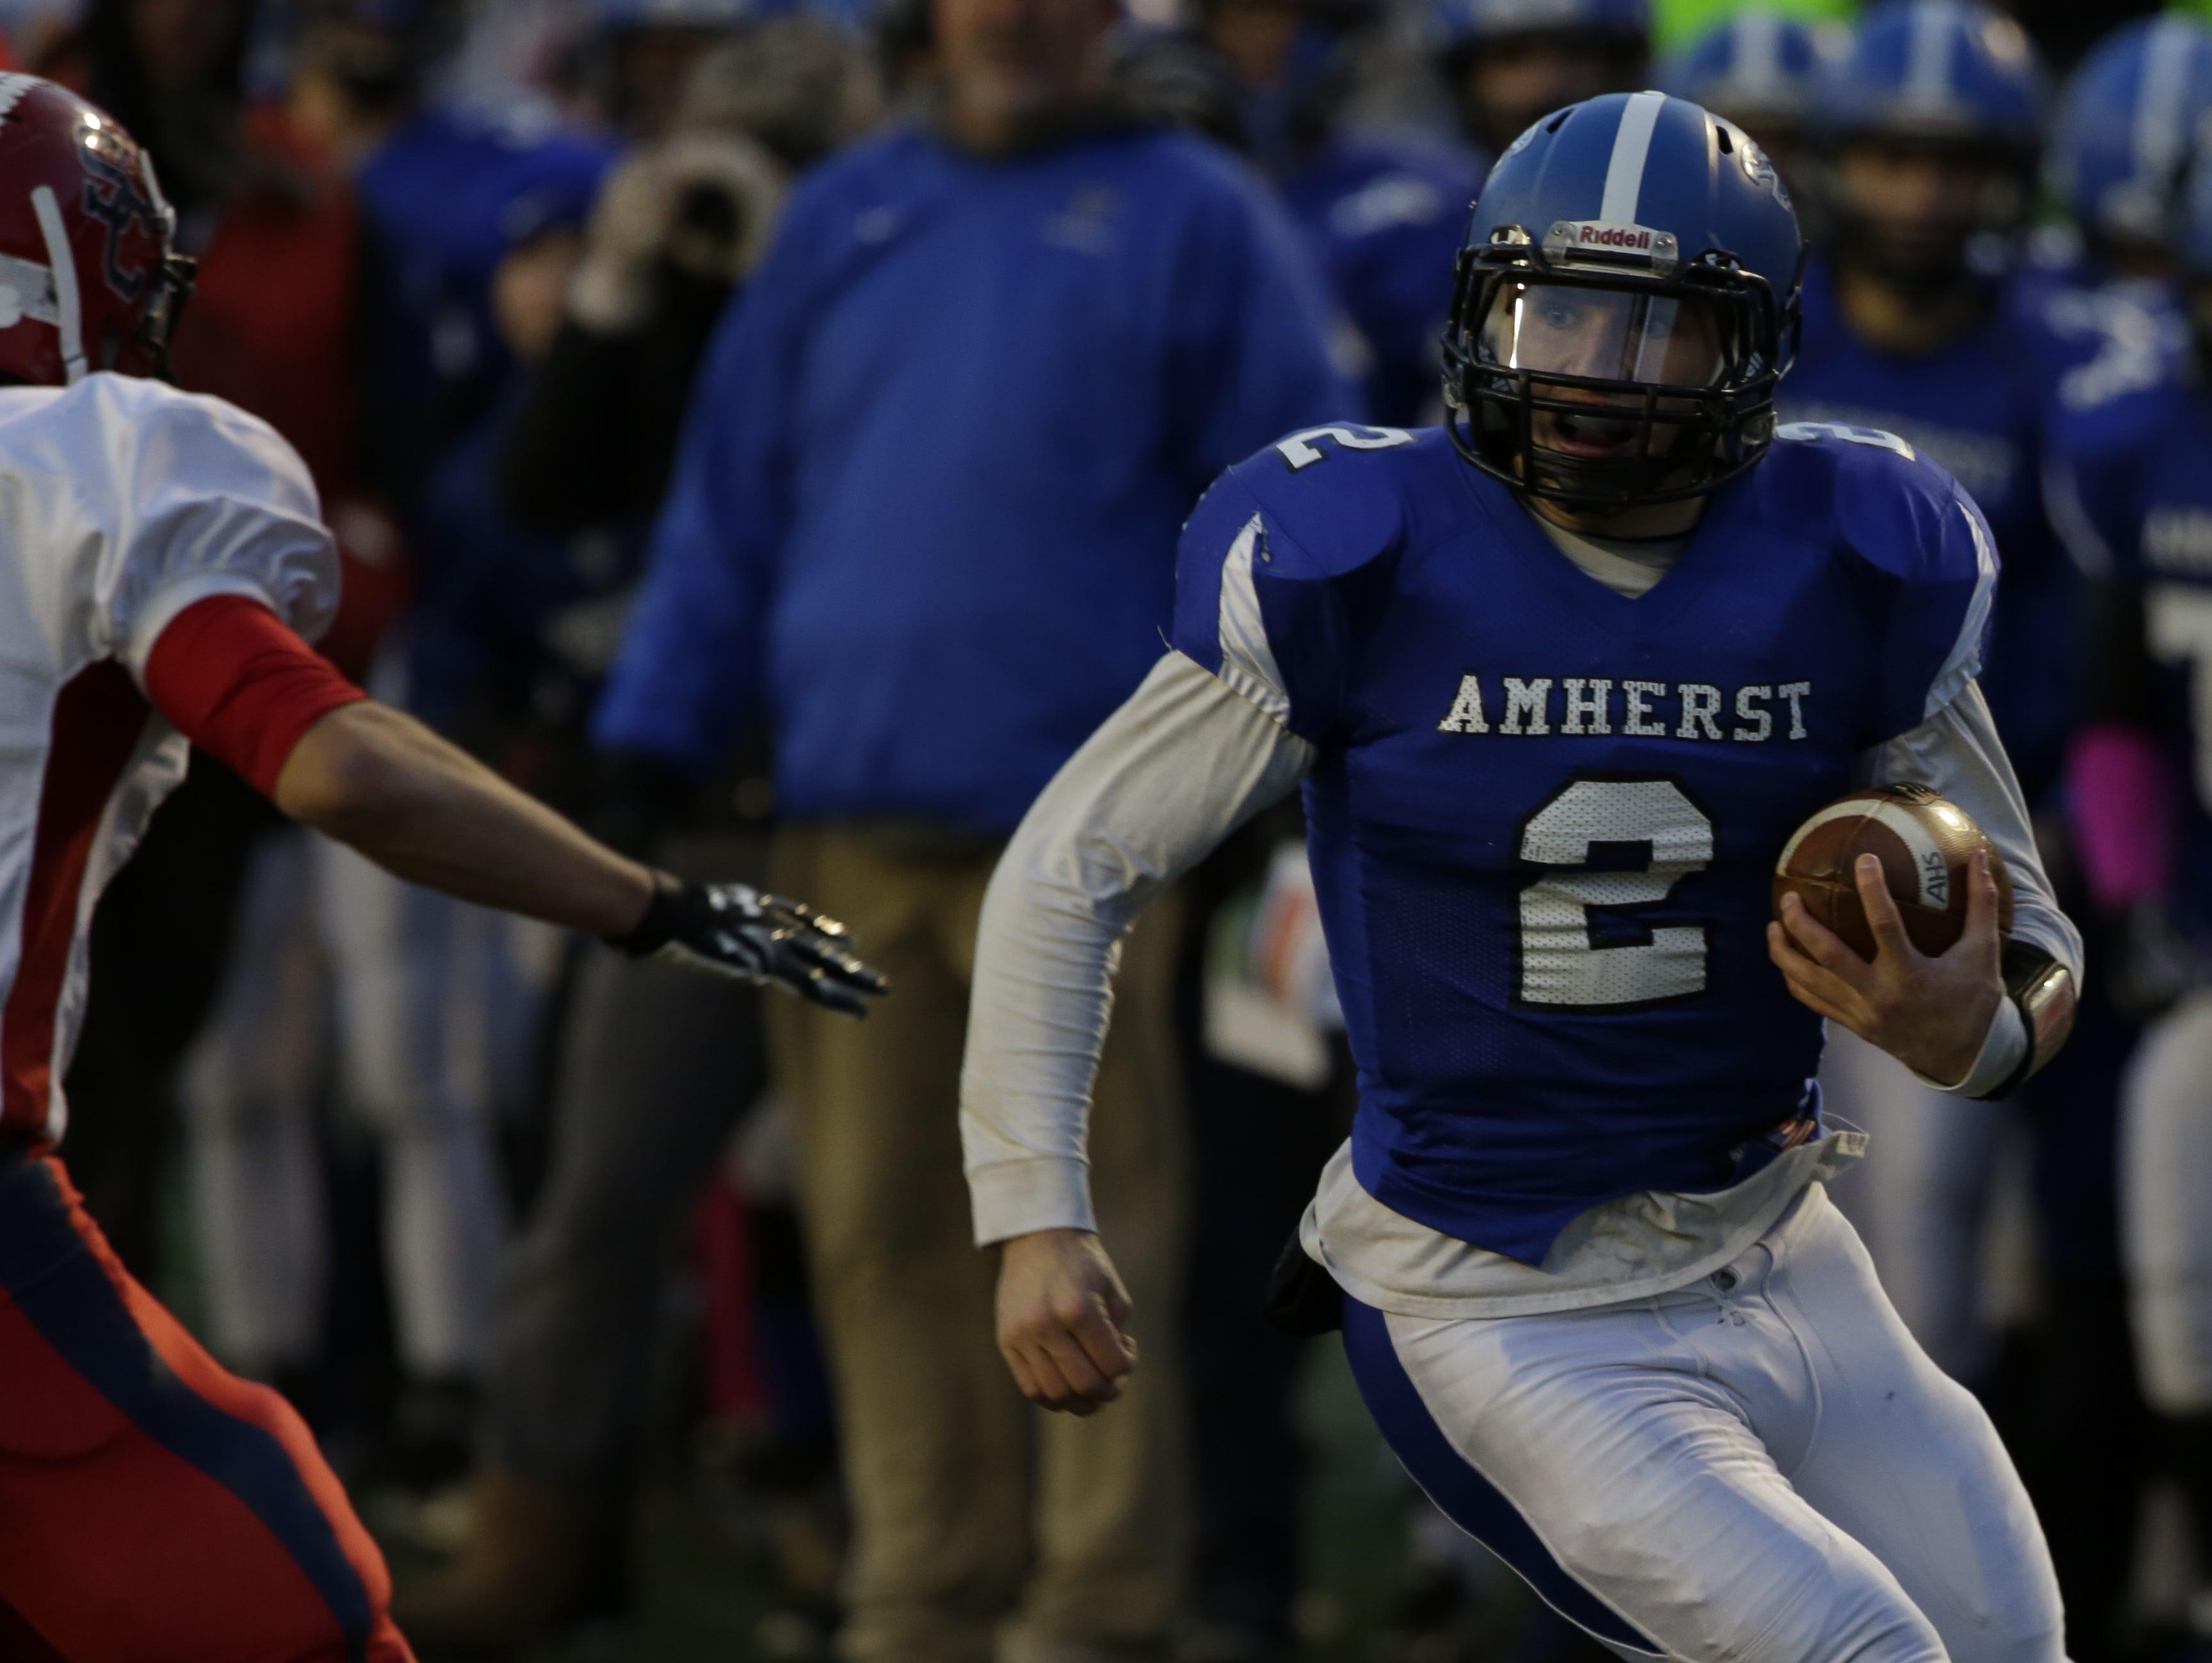 Amherst's Garrett Groshek rushed and passed for more than 3,800 yards this season.